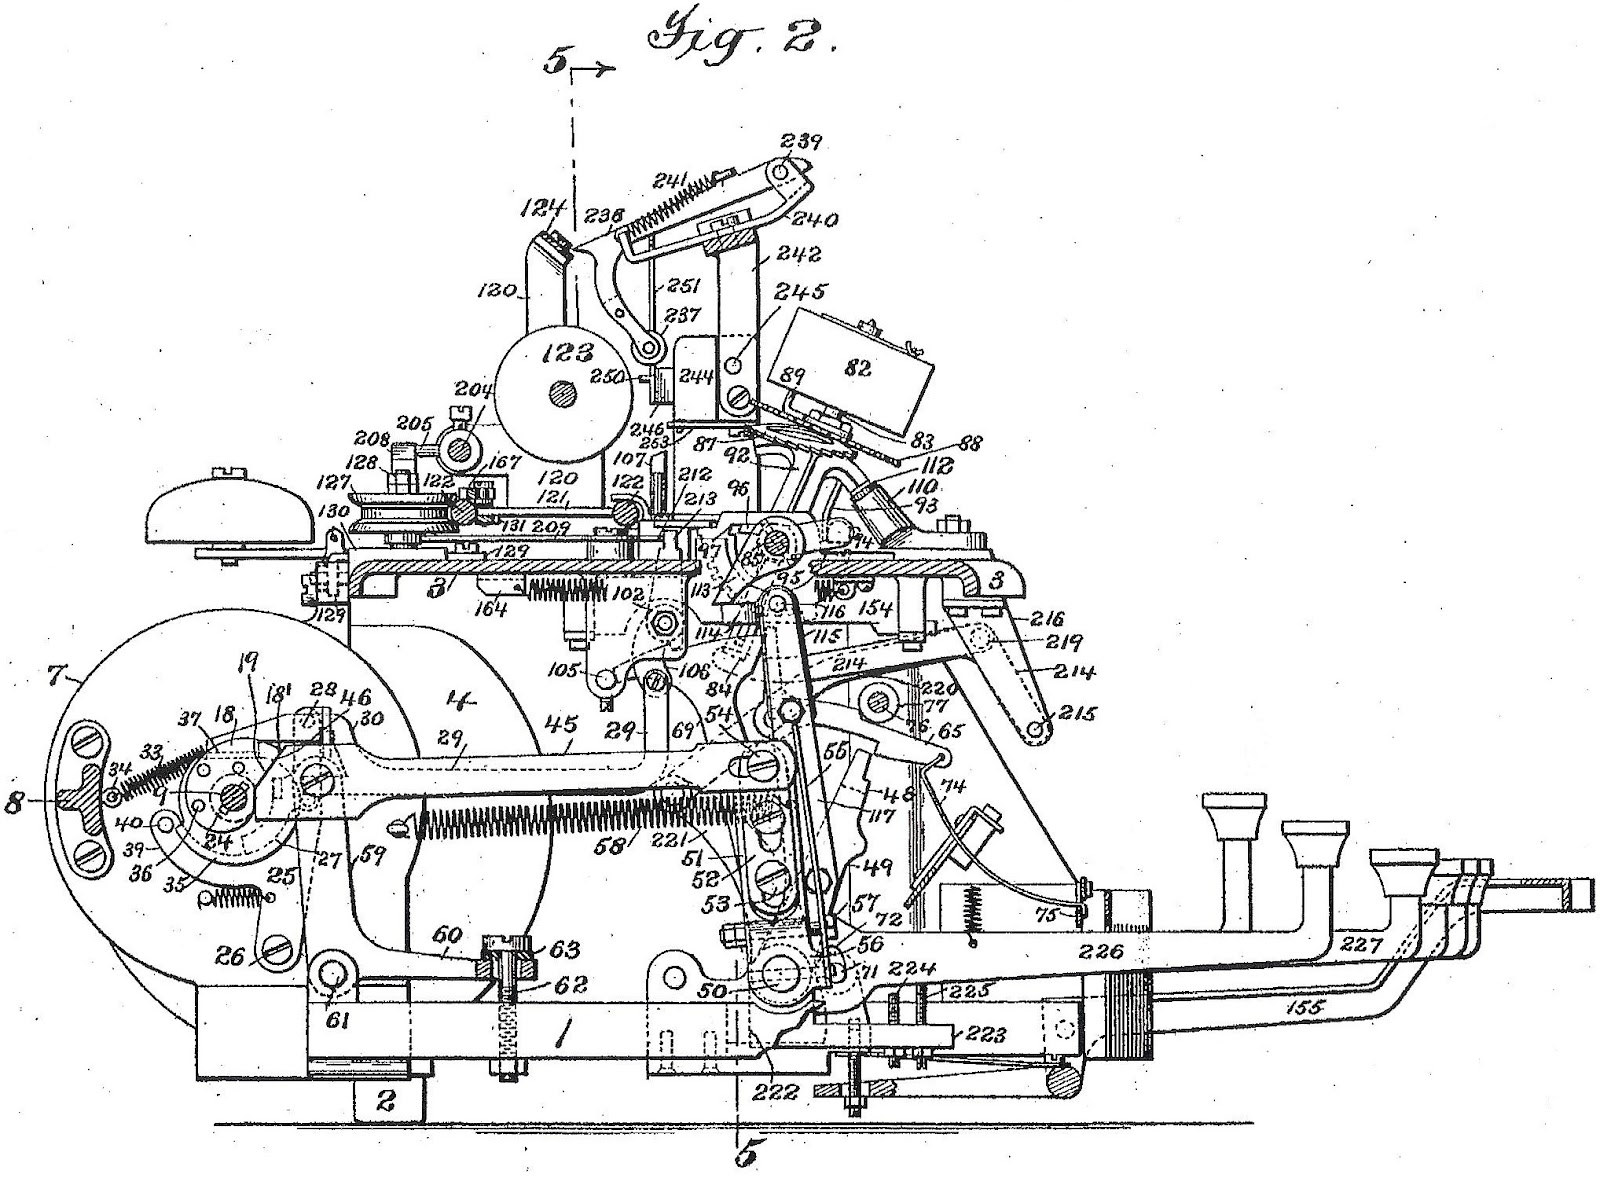 Oztypewriter Future Shock How Blickensderfer Developed His Mad Max Engine Diagram Electric Typewriter